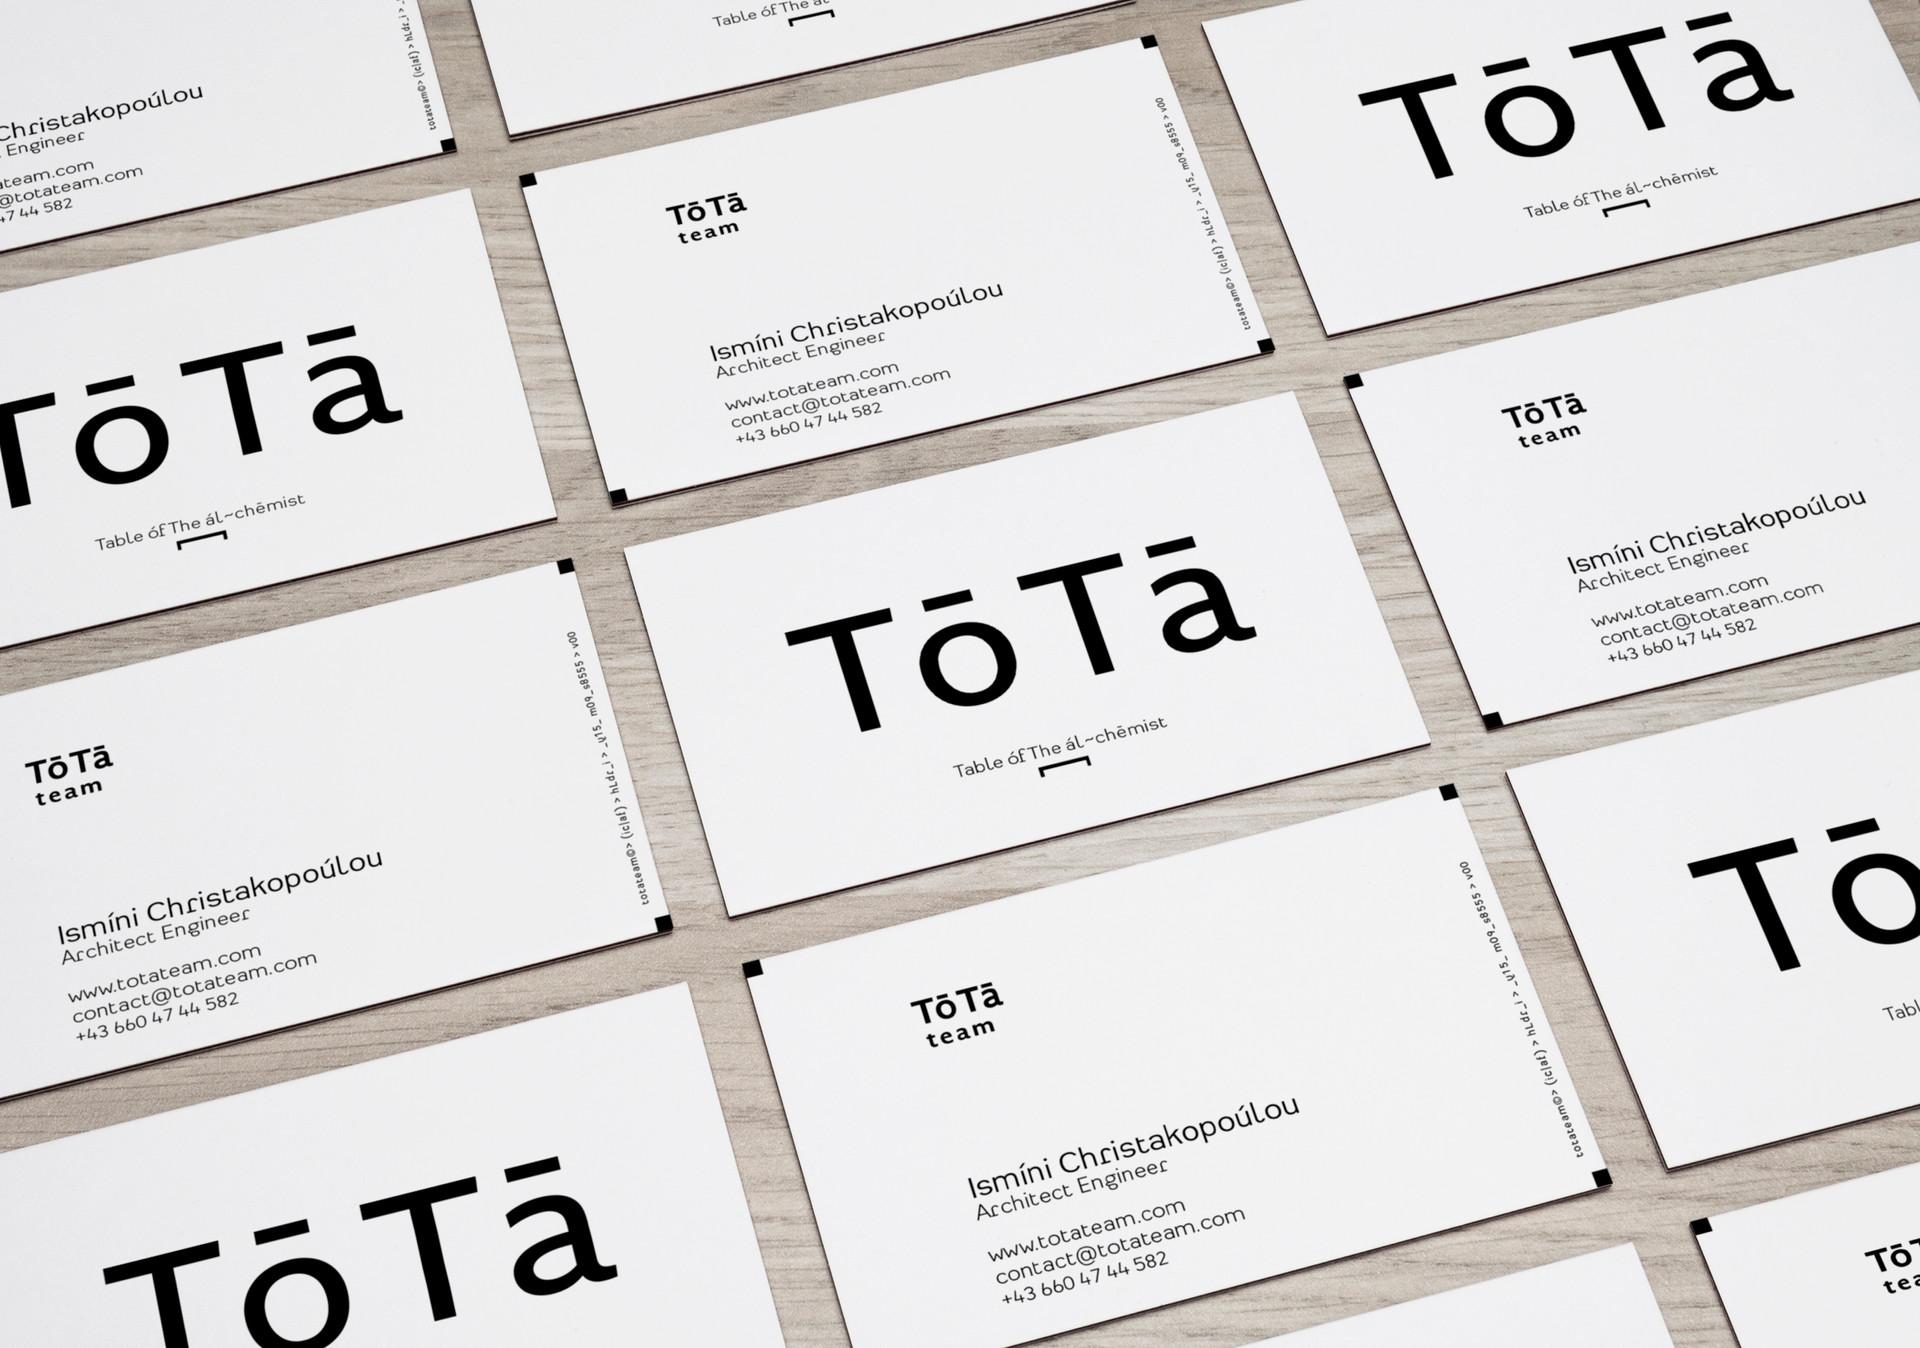 tota_b cards.jpg